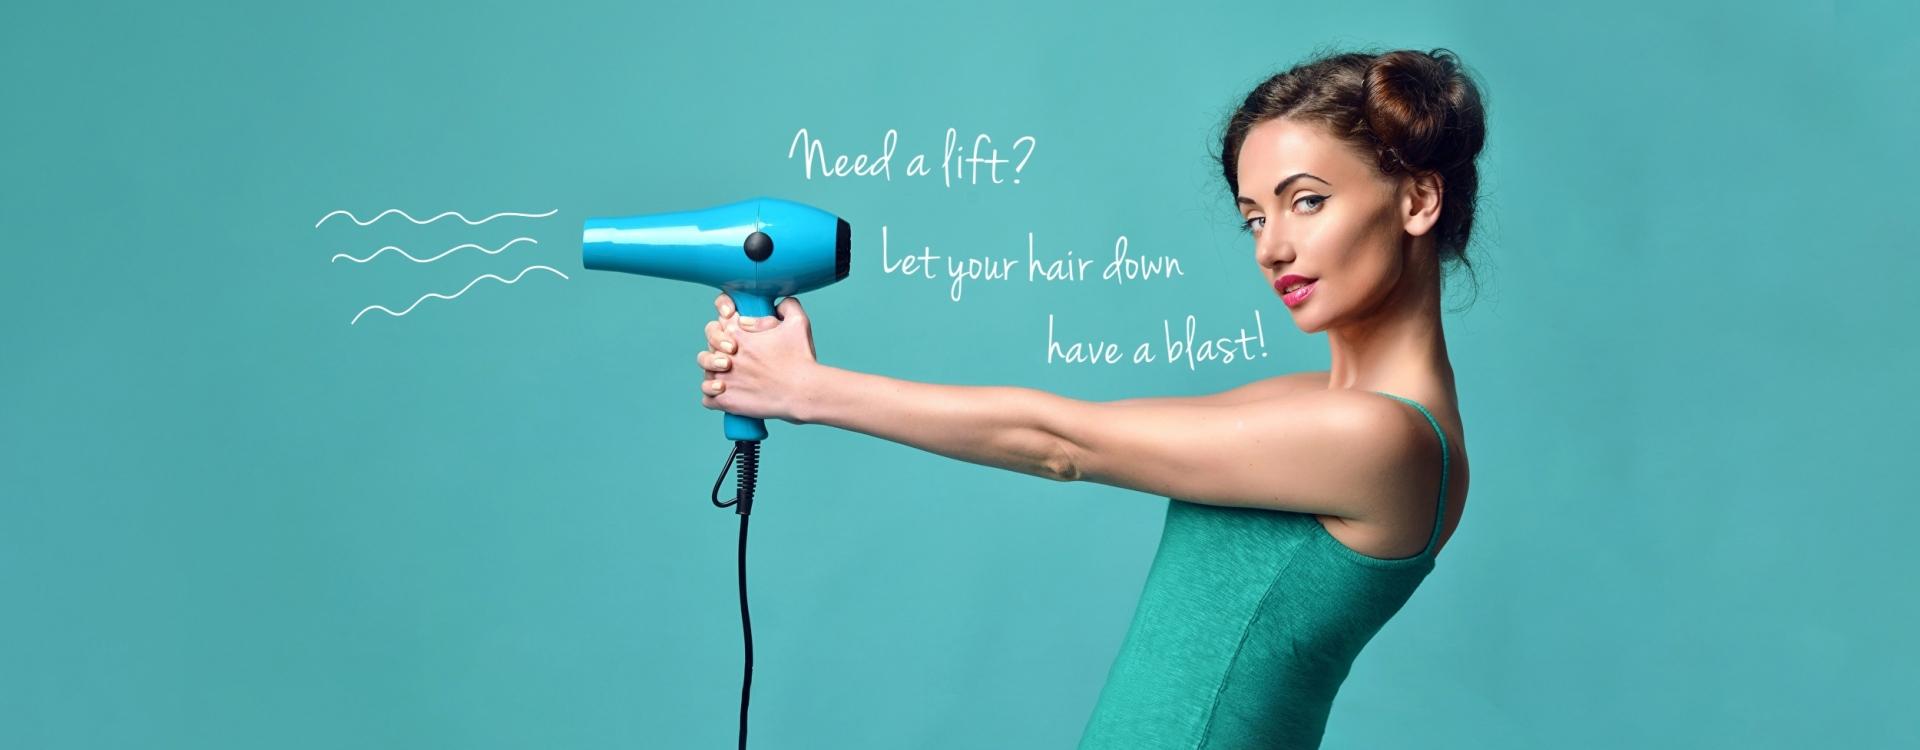 Work pifco hairdryer girl